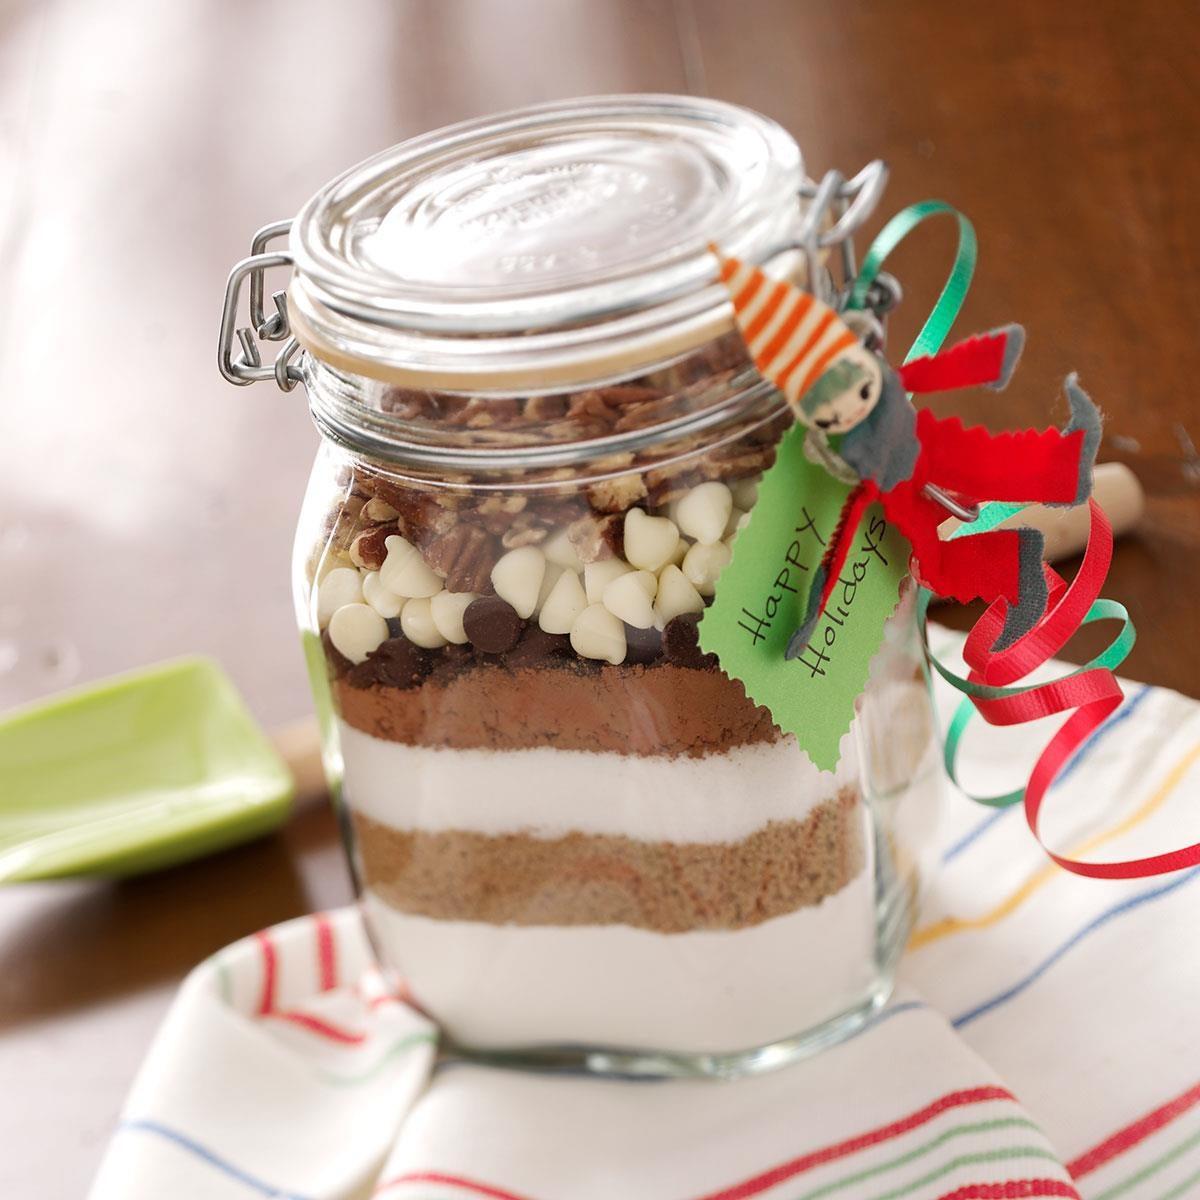 Grandma S Chocolate Cake With Brownie Mix